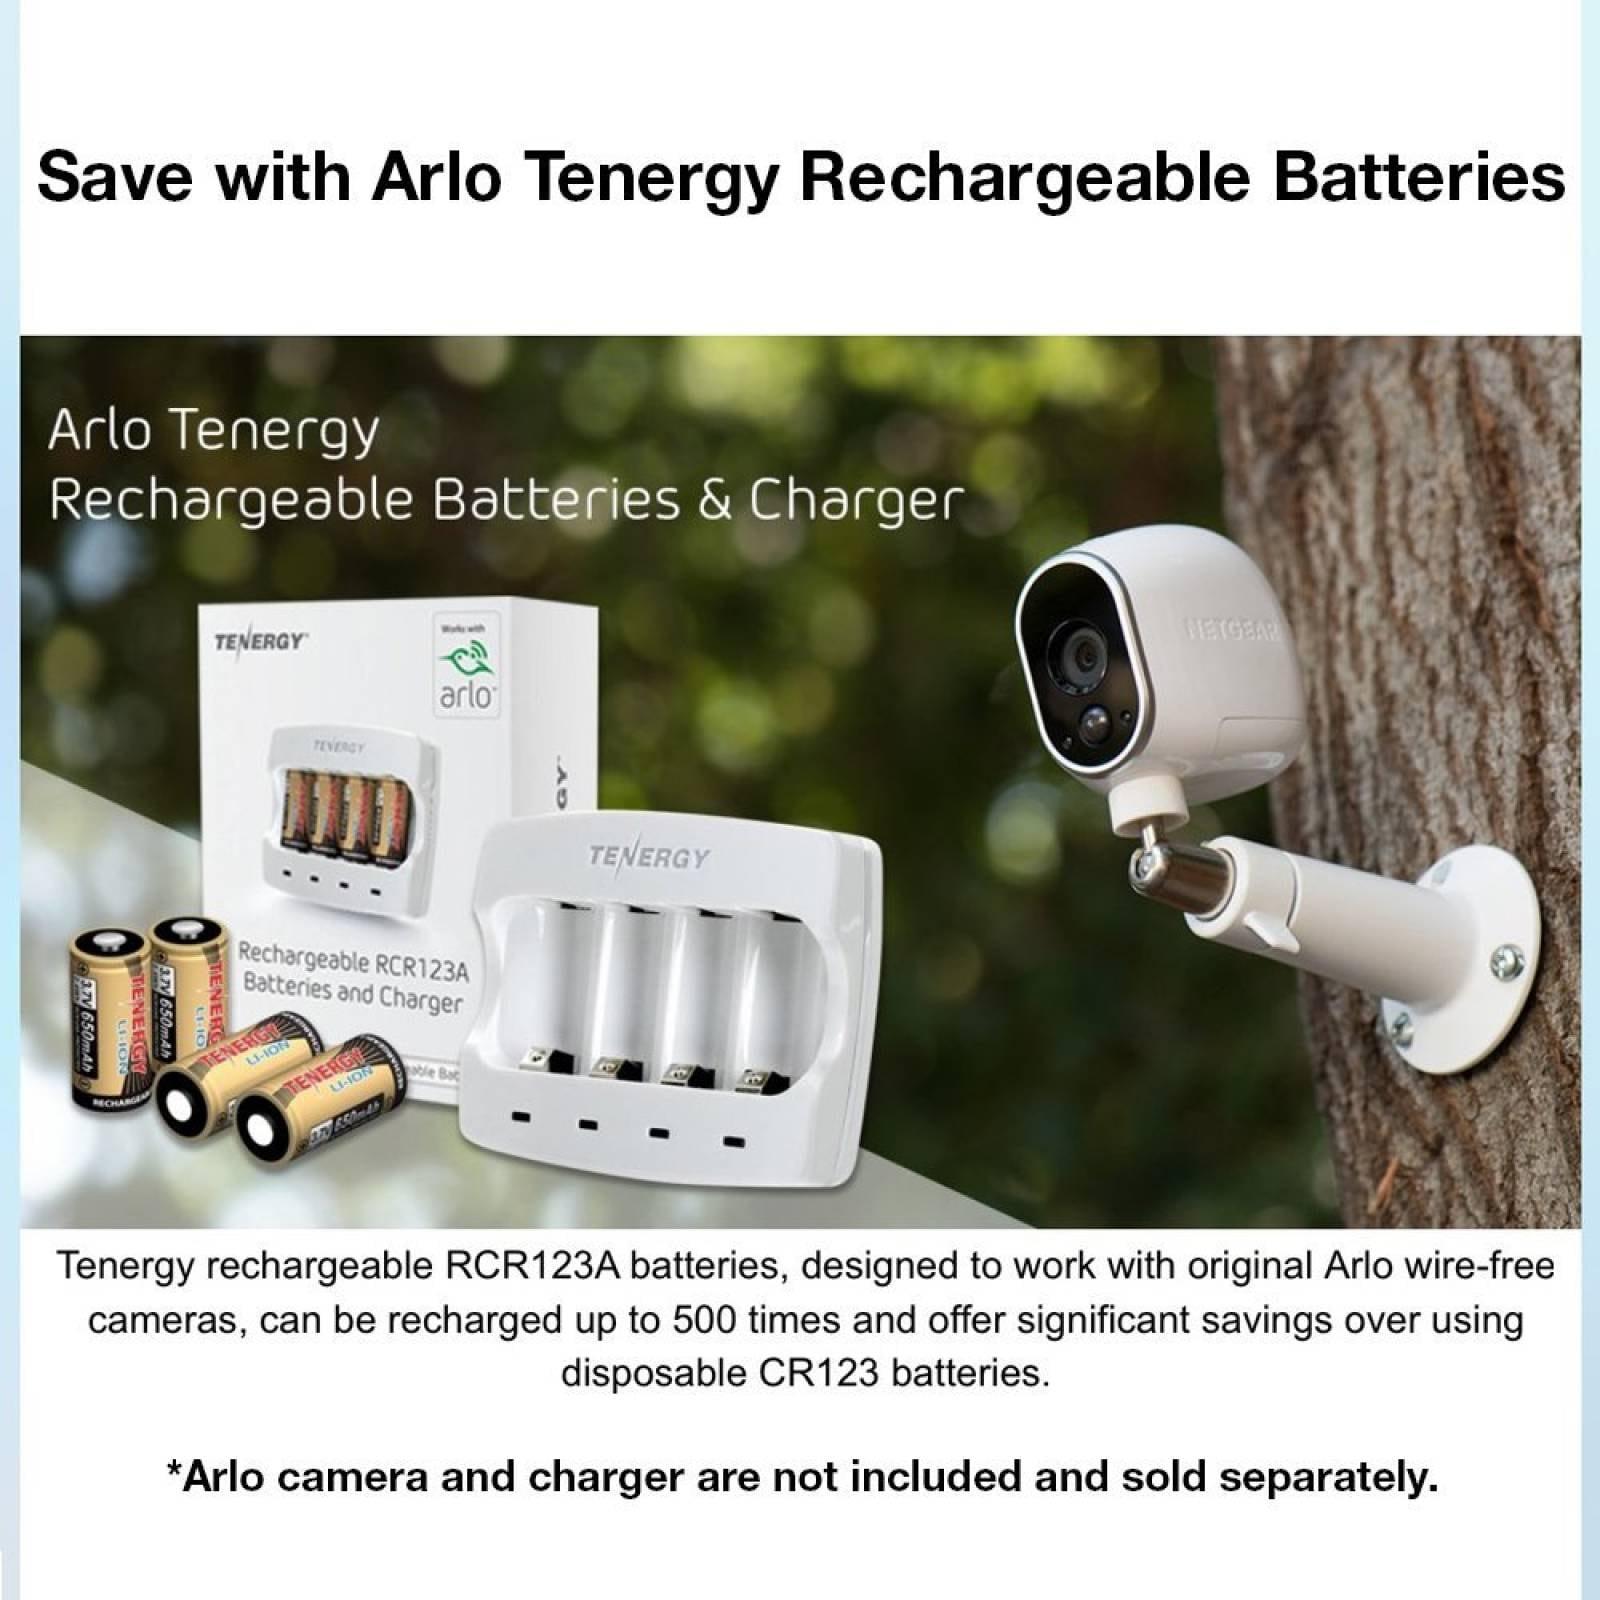 Tenergy 3.7V Li-ion recargable Arlo VMC30 cámaras seguridad